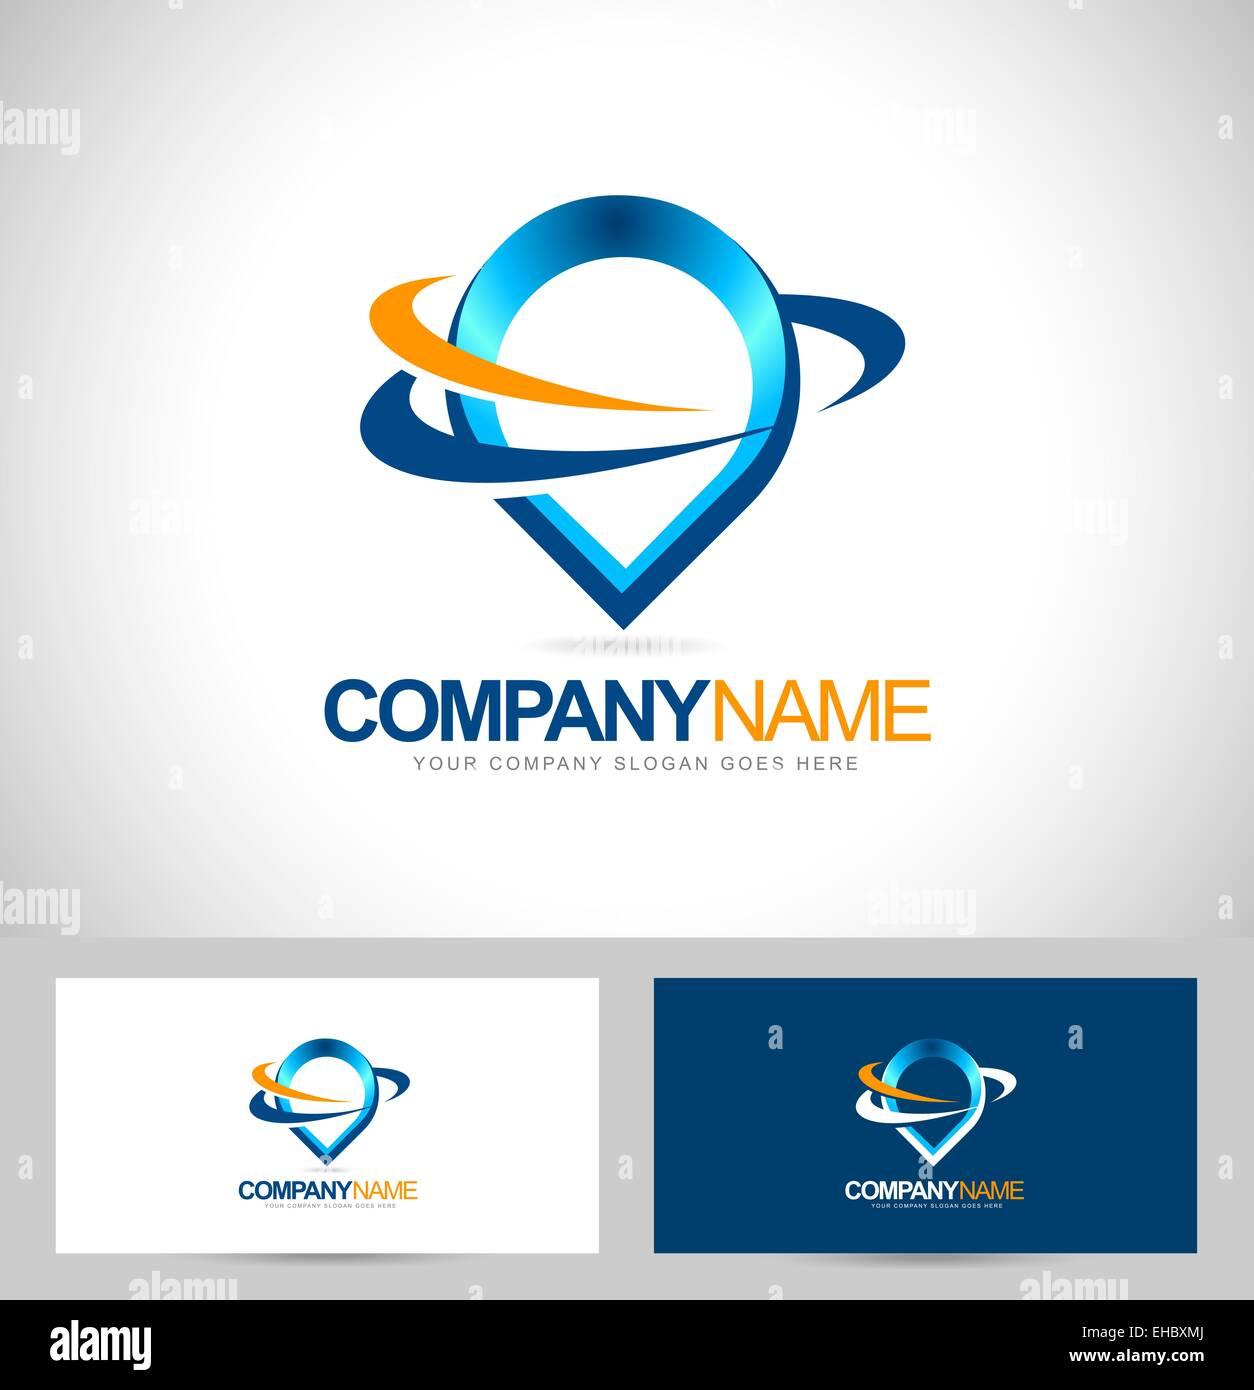 Water Drop Logo Design. Creative Water Drop Vector with business ...